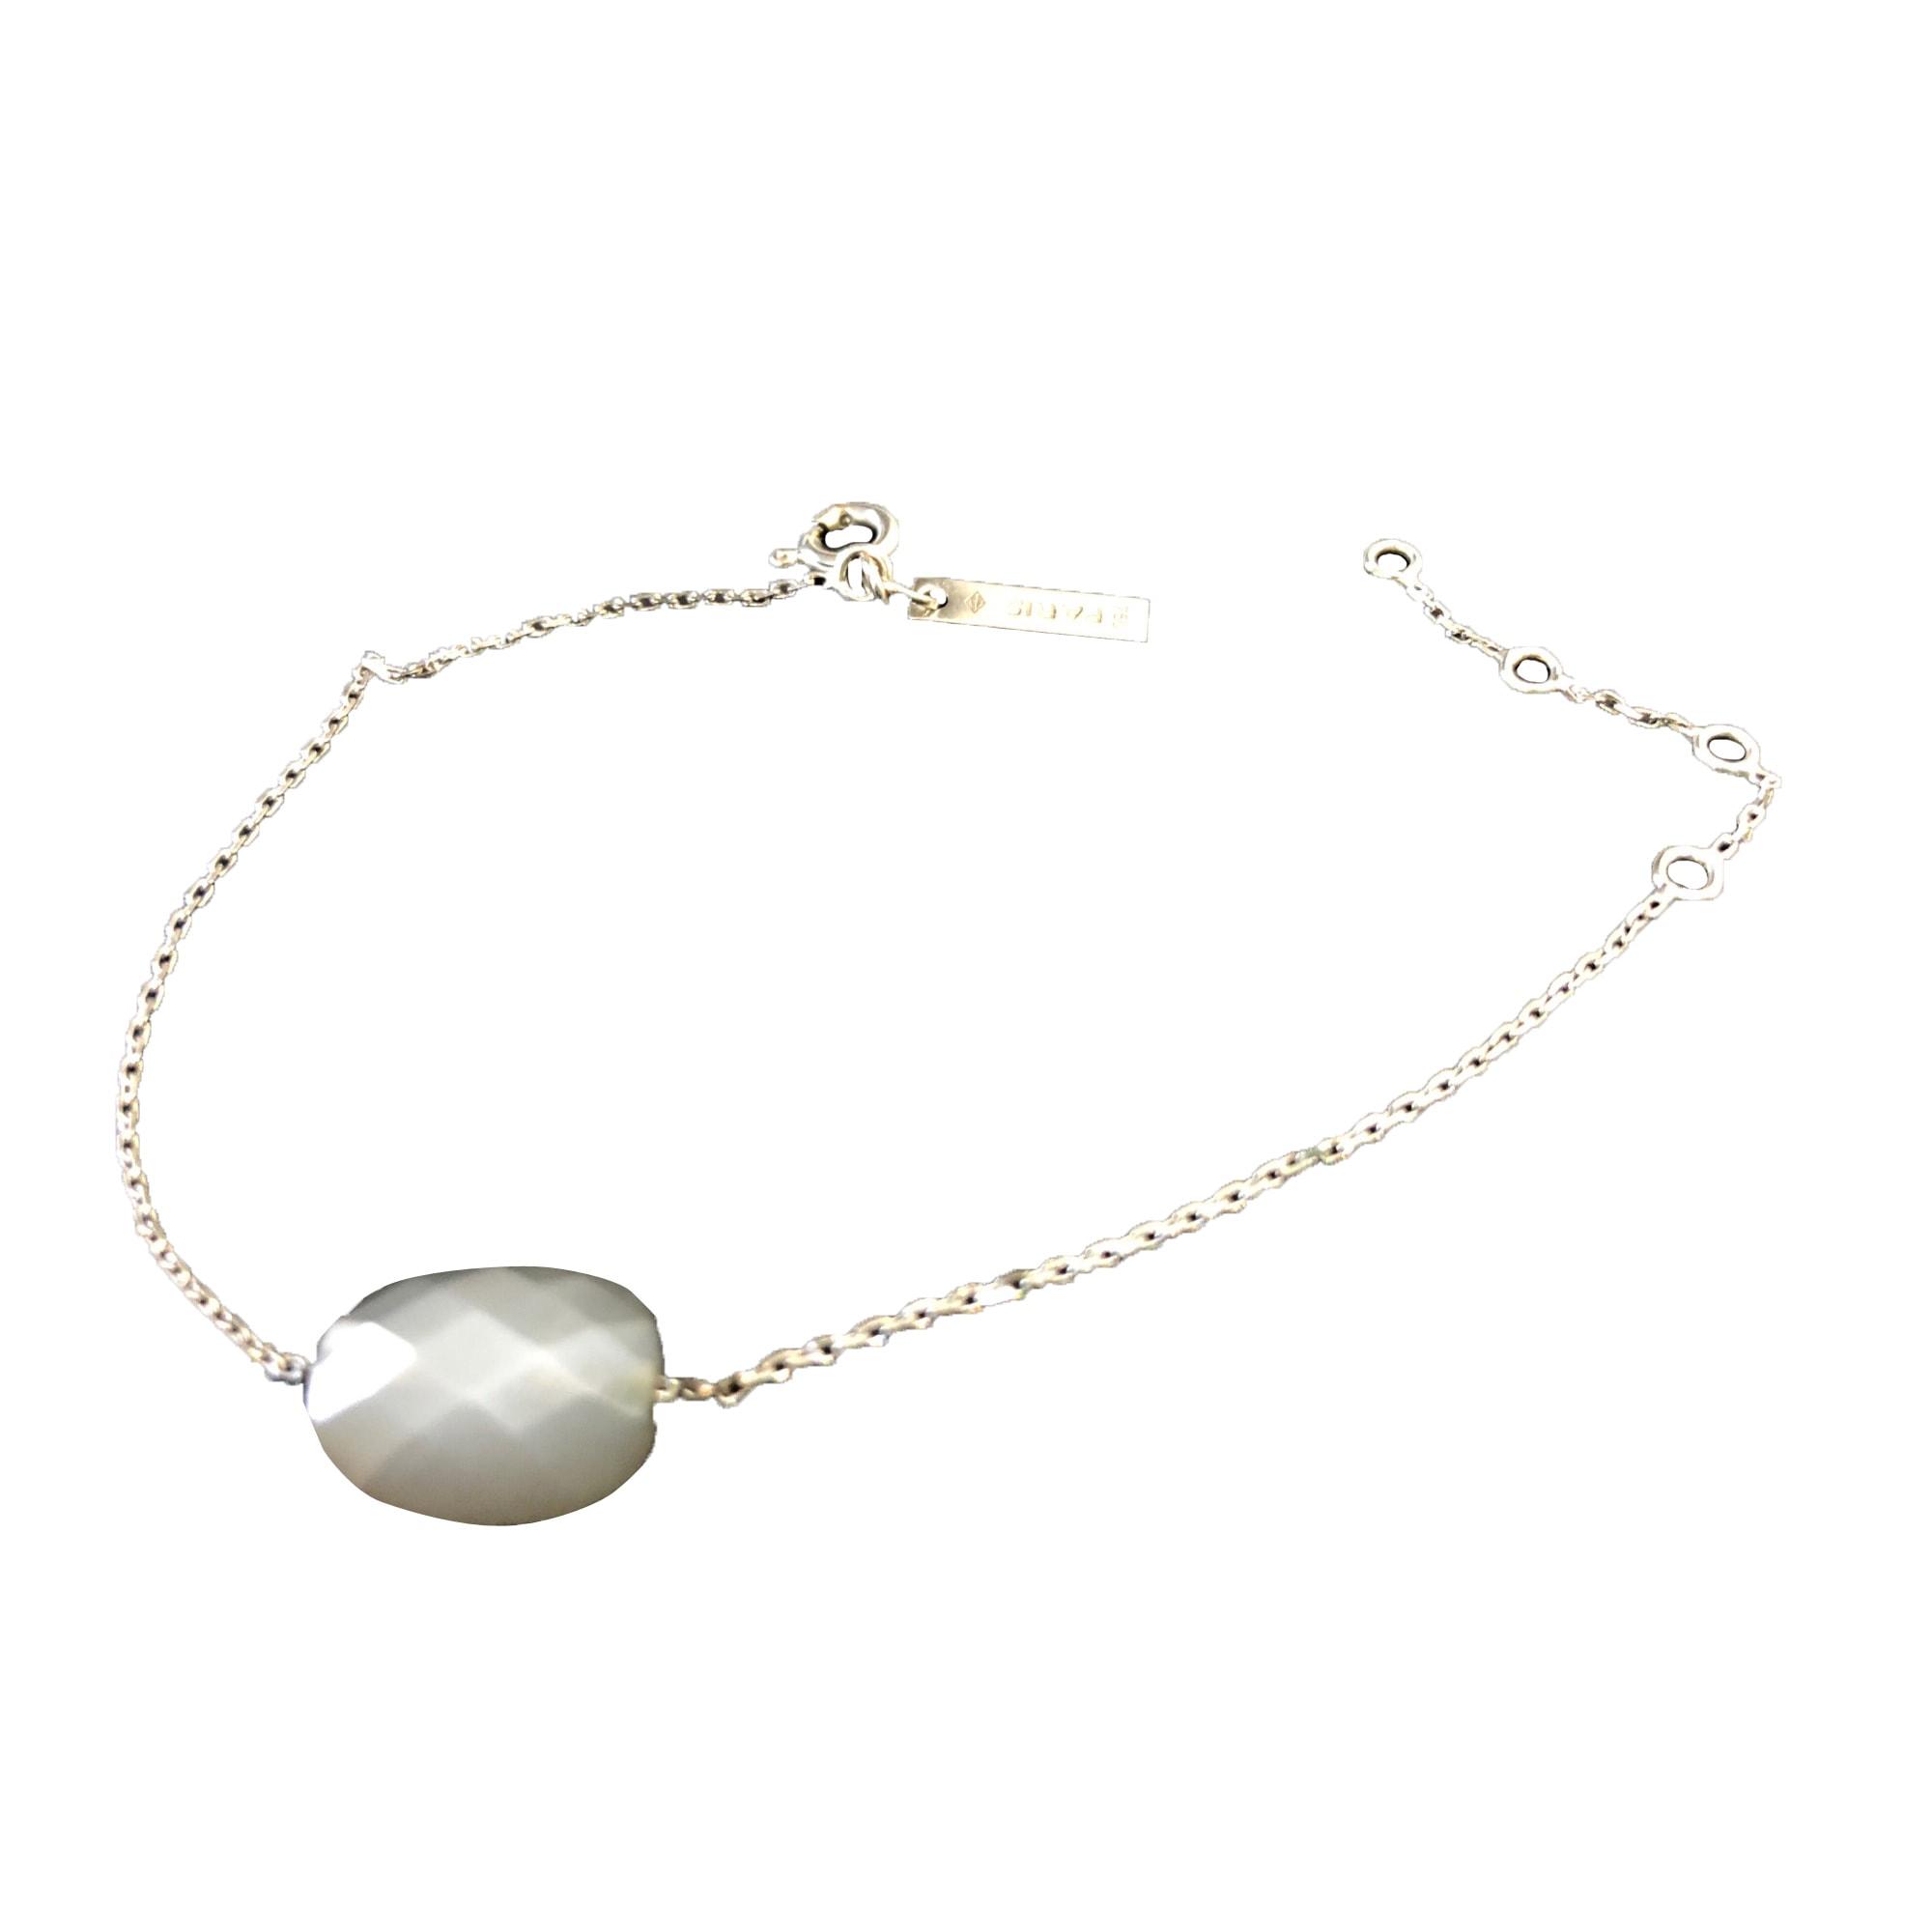 Bracelet MORGANNE BELLO Gris, anthracite